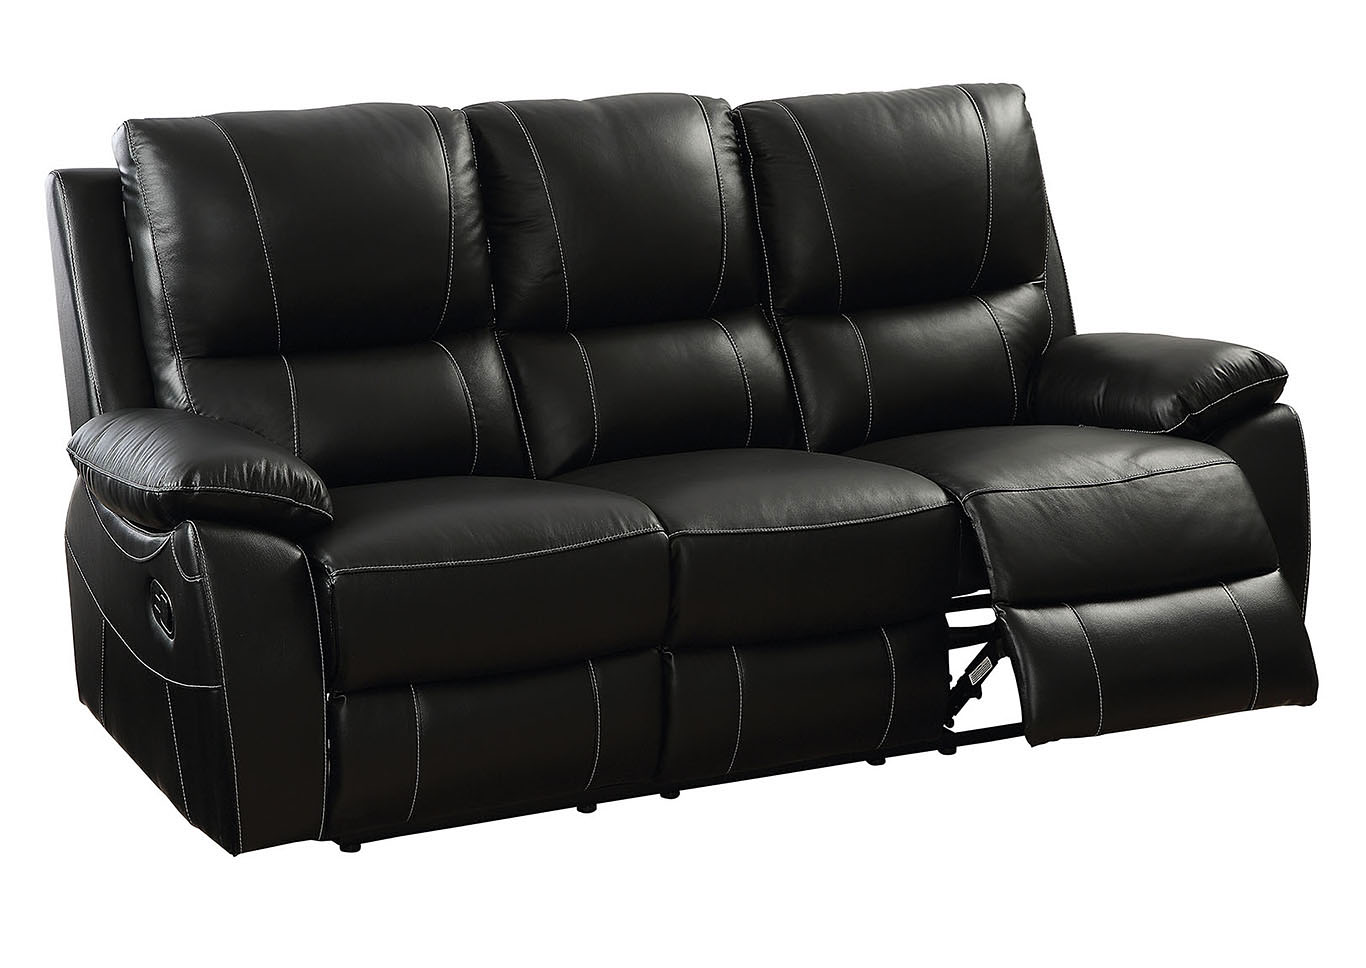 Factory Expo Furniture Nena Black Top Grain Leather Reclining Sofa